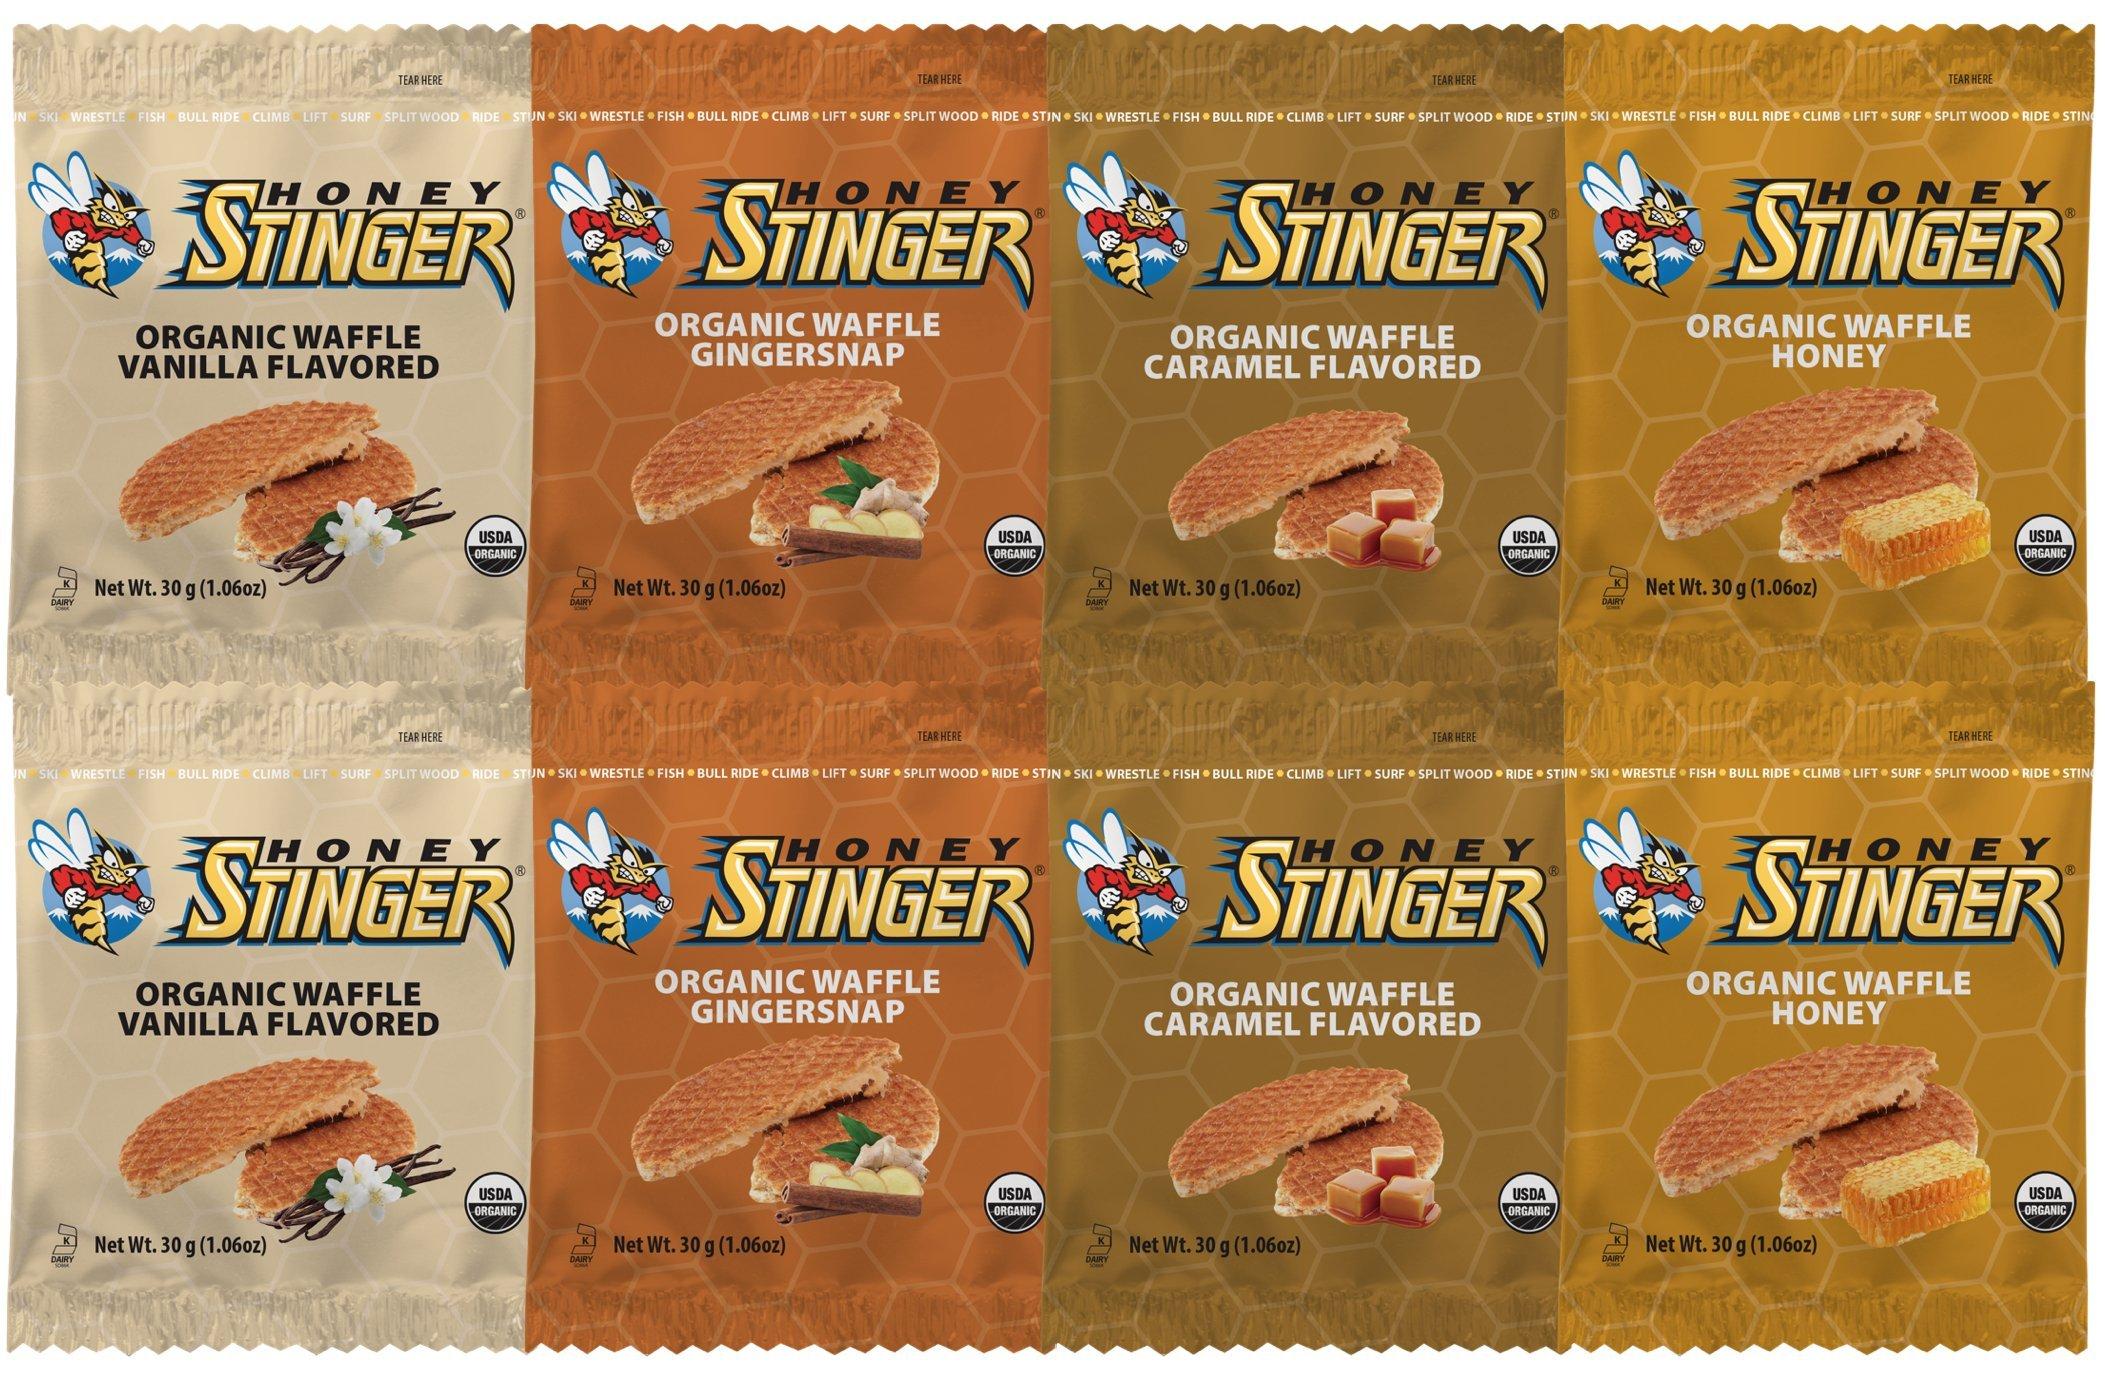 Honey Stinger Waffle 4 Flavor Variety Pack (Pack of 8) by Honey Stinger